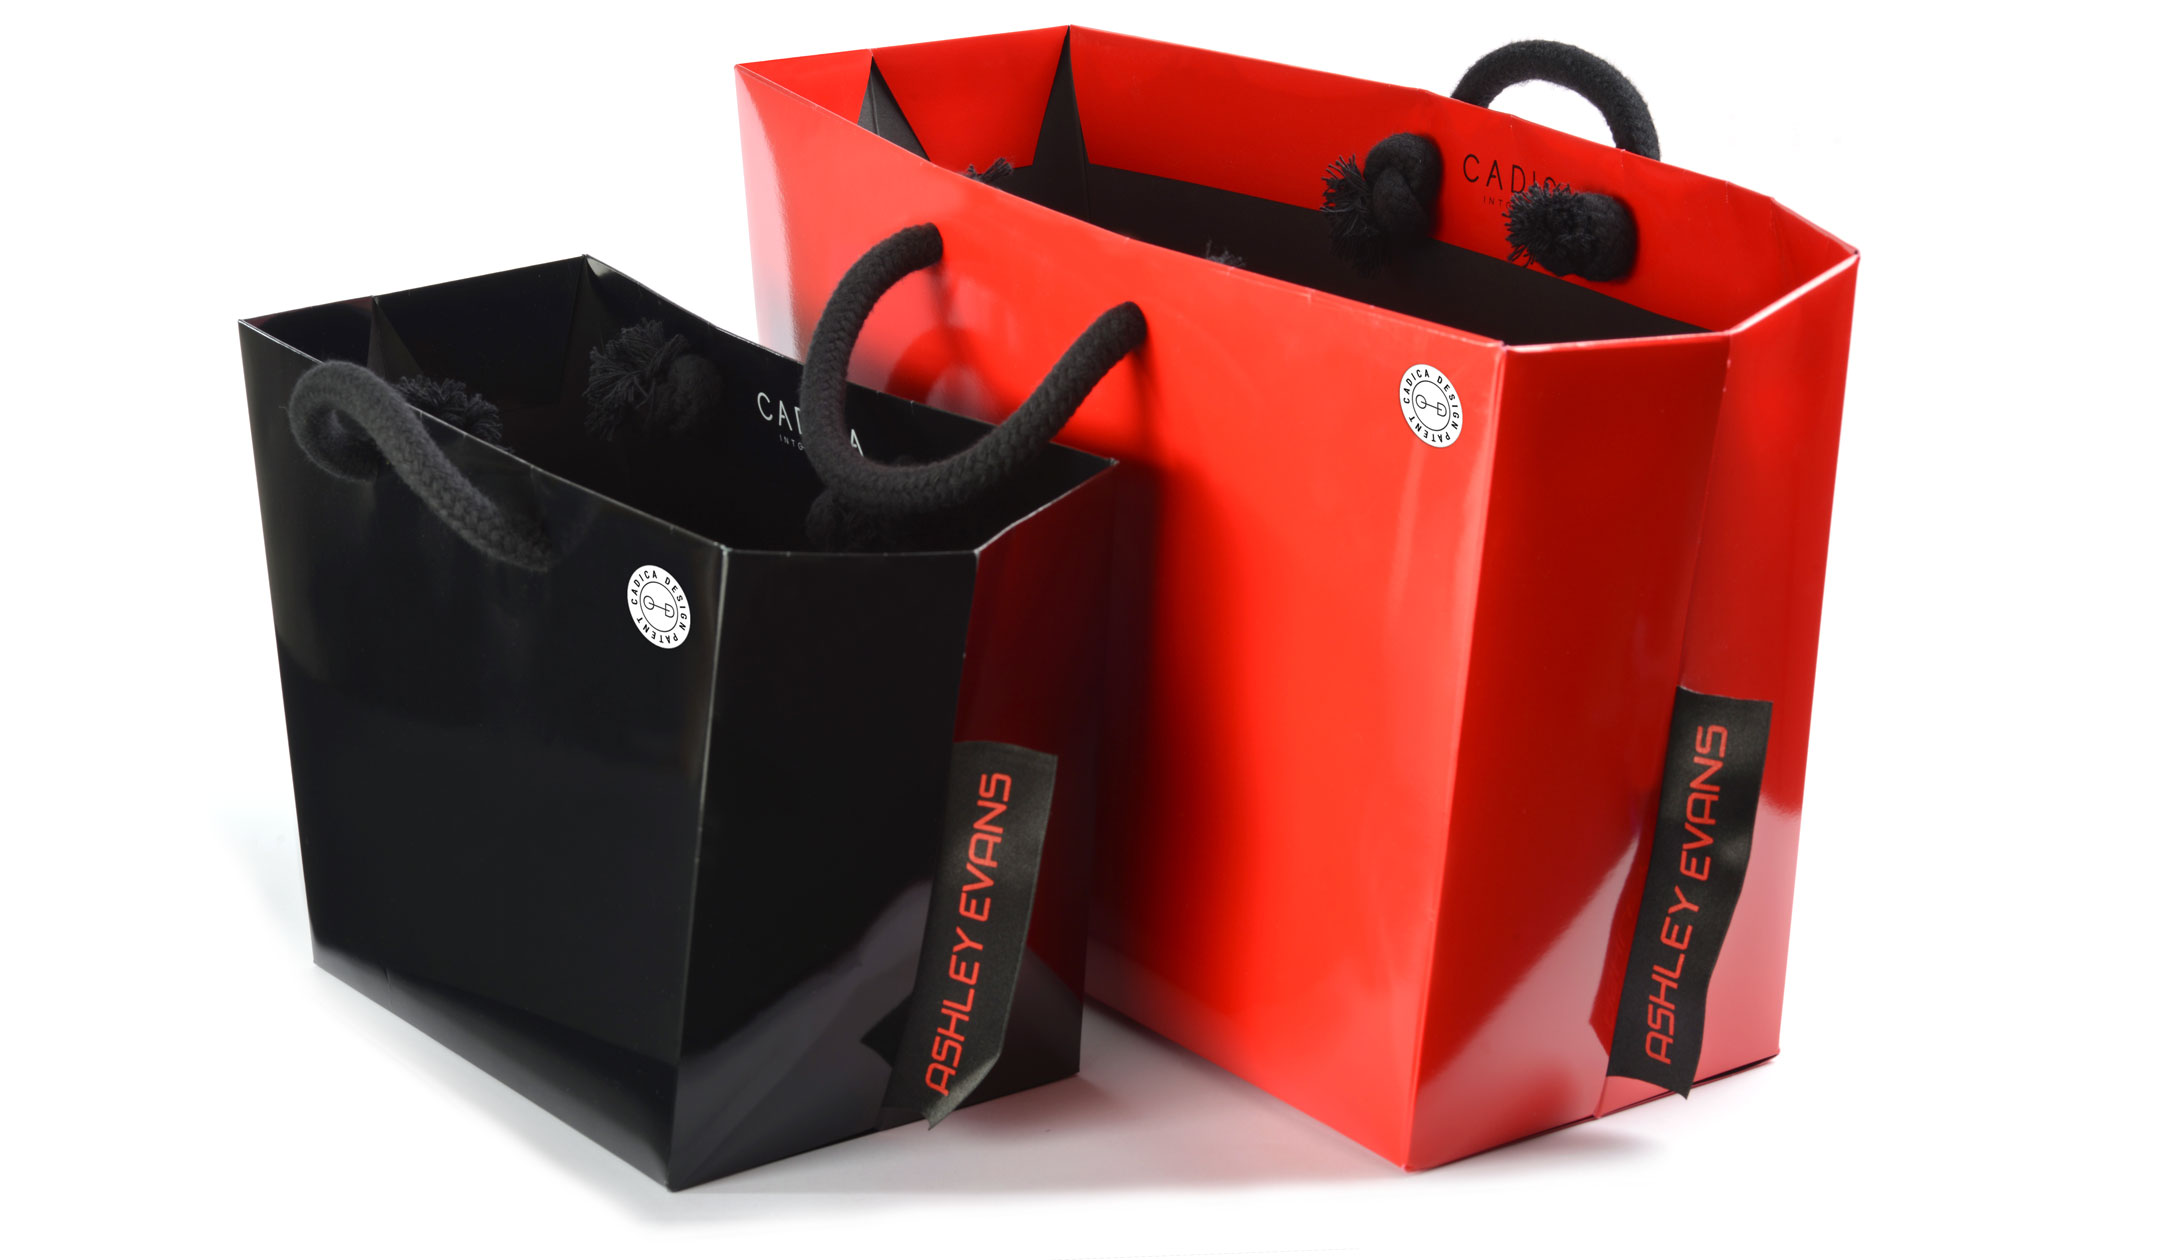 AshleyEvans_brevetto_Cadica_packaging